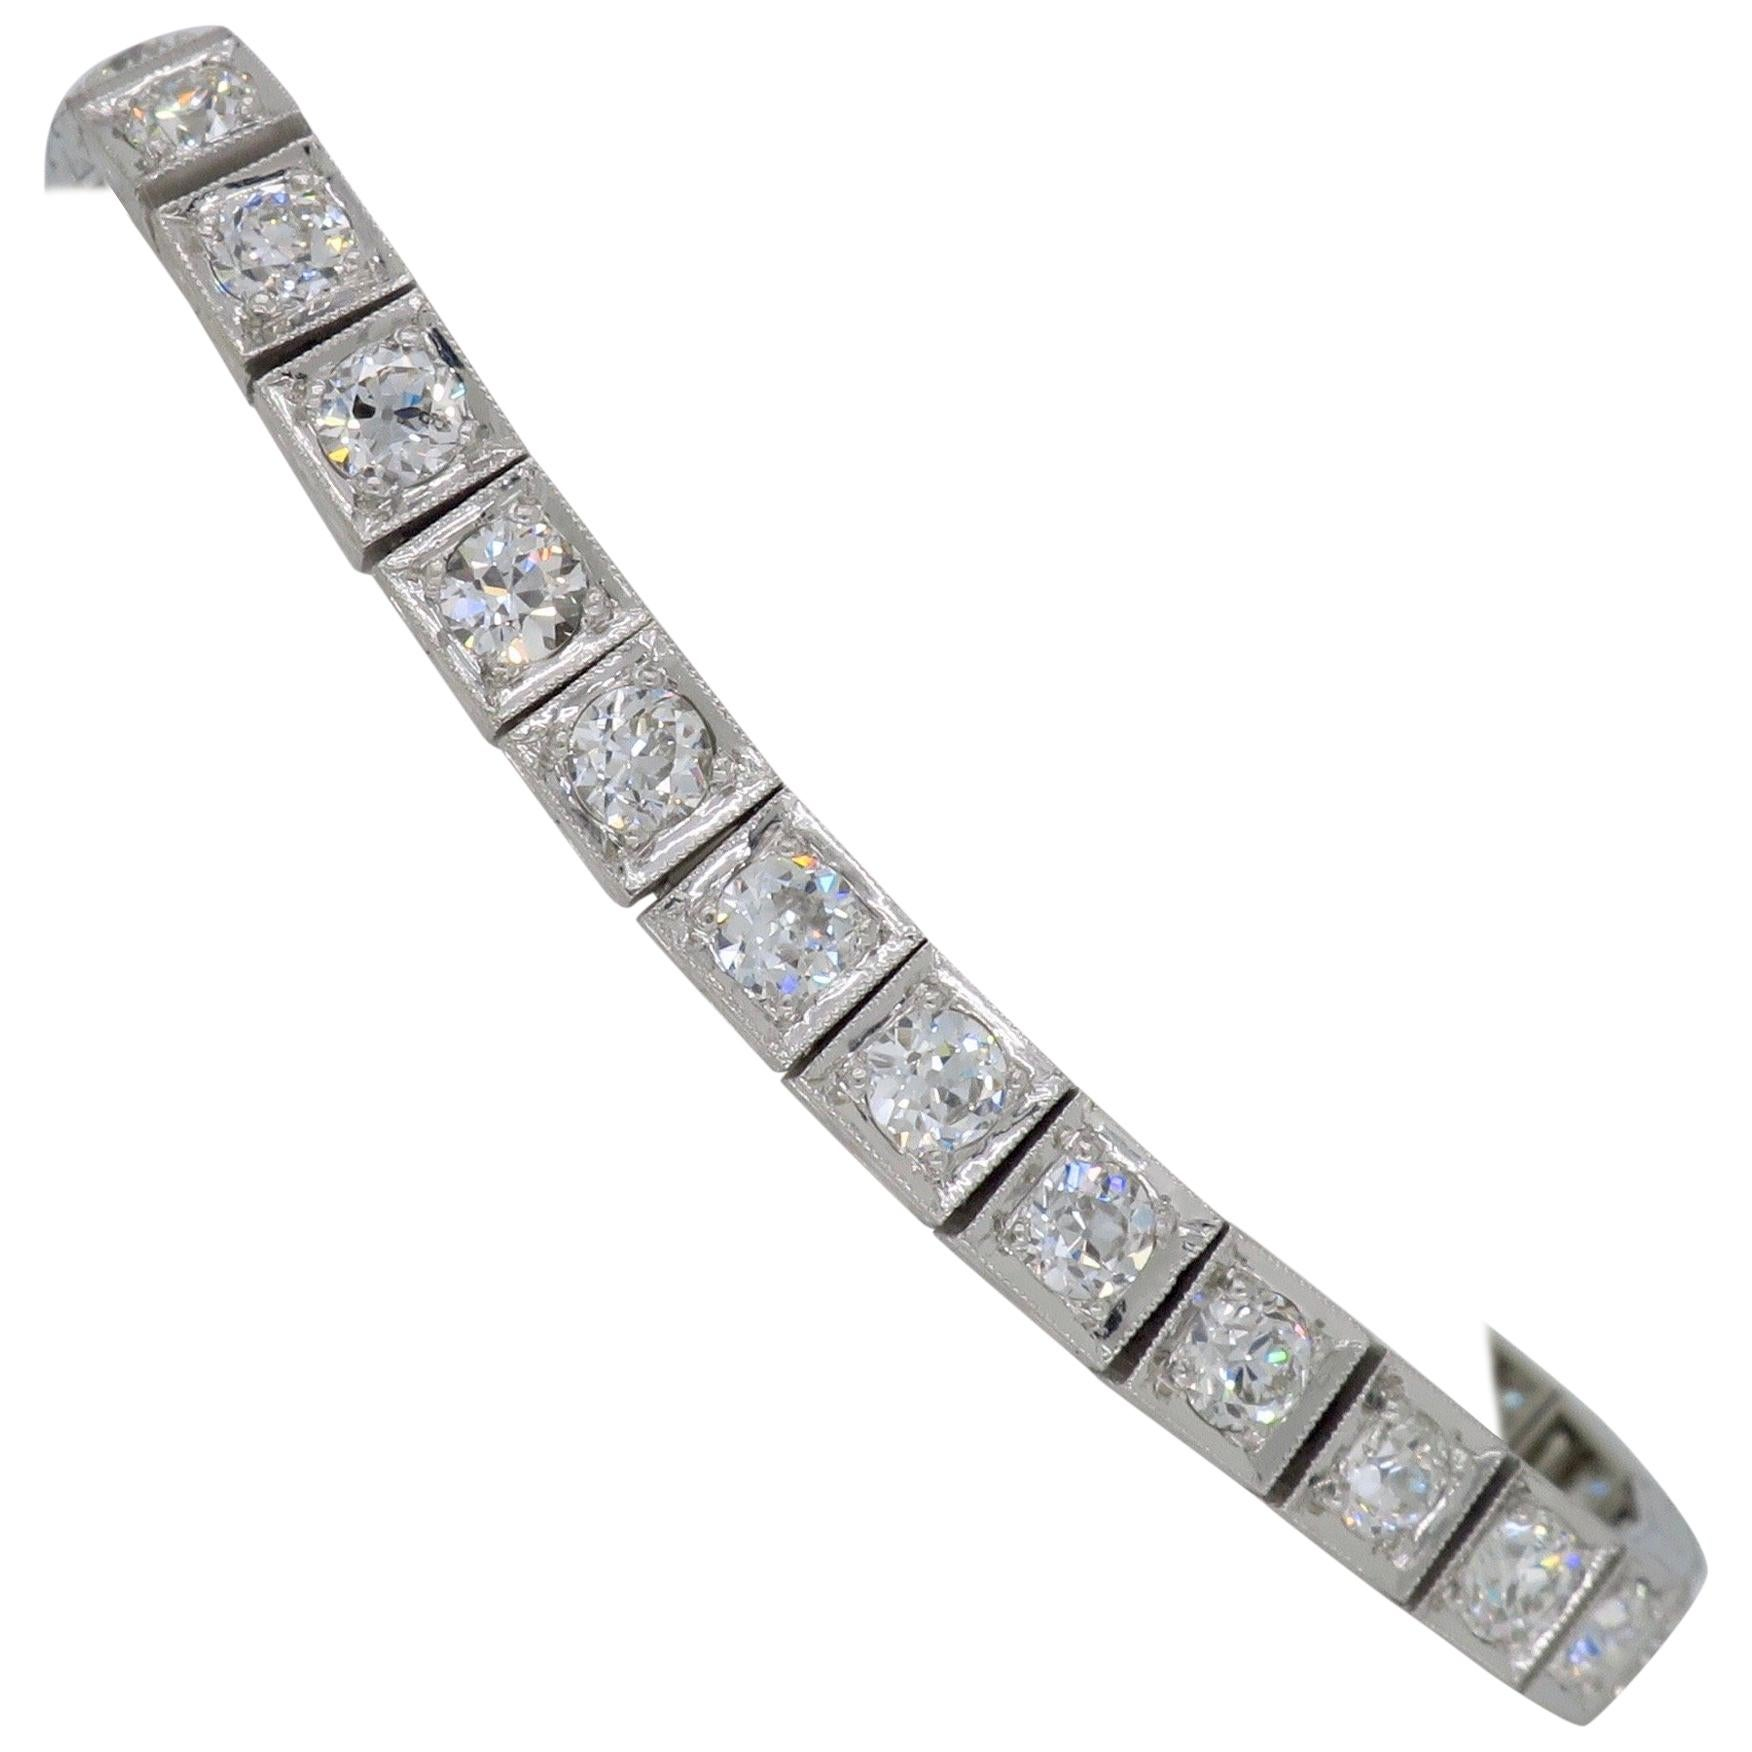 Platinum 5.85 Carat Old European Cut Diamond Tennis Bracelet